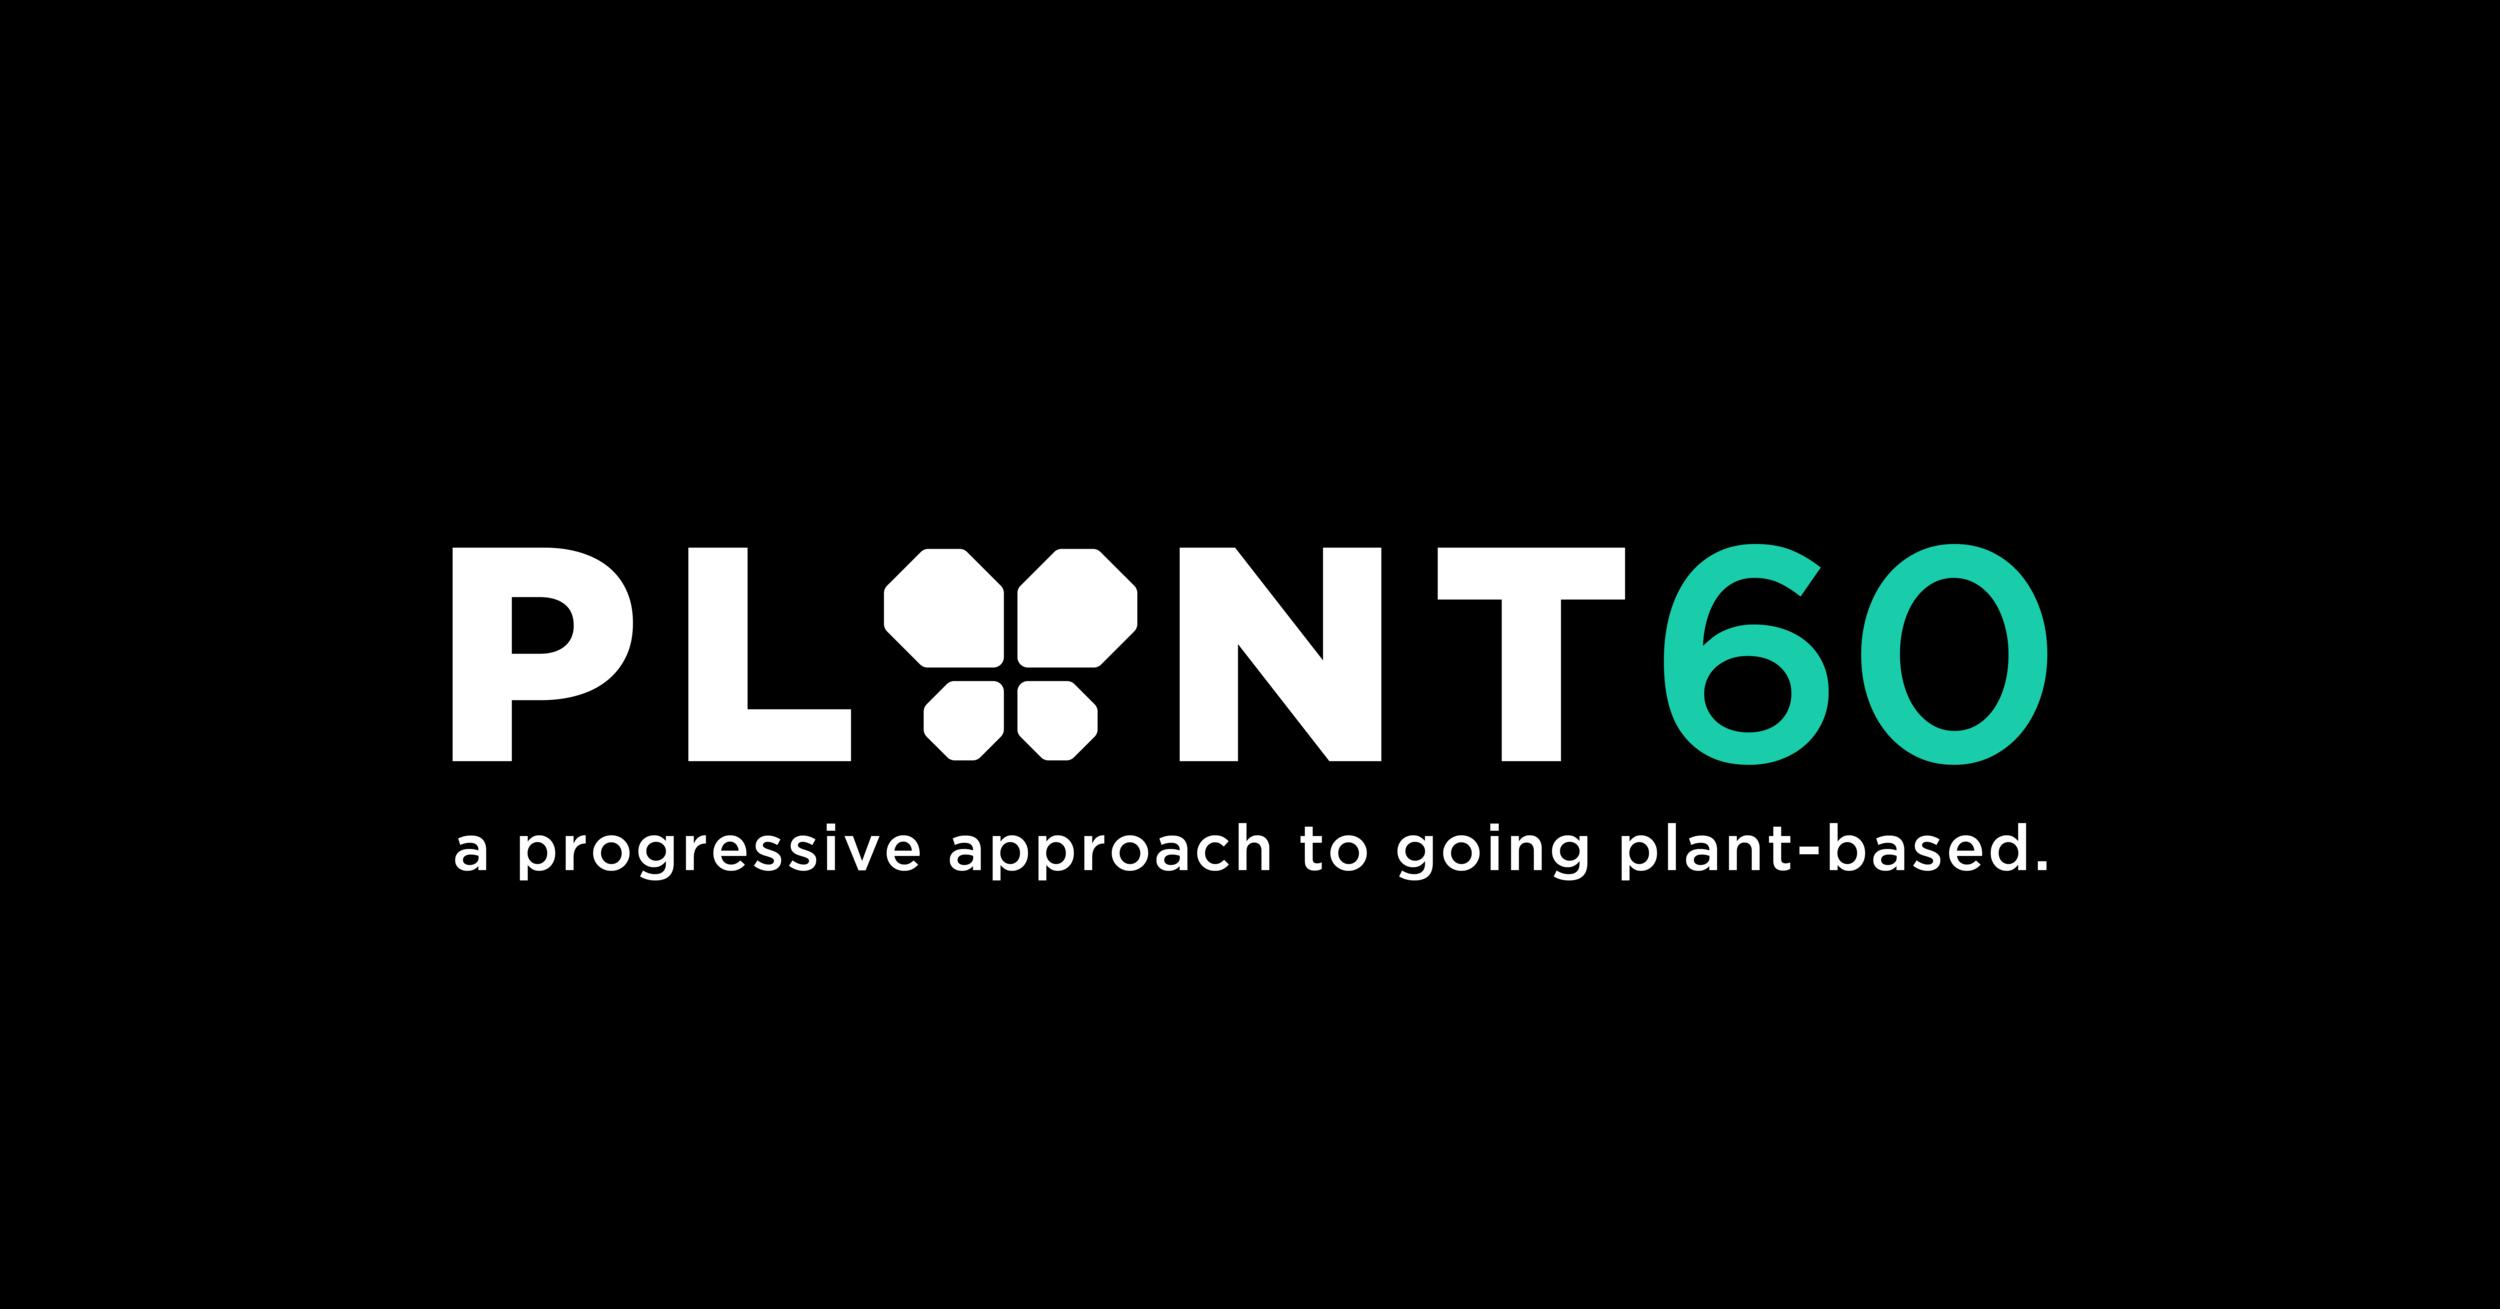 plant-60-social-share-image-black.png